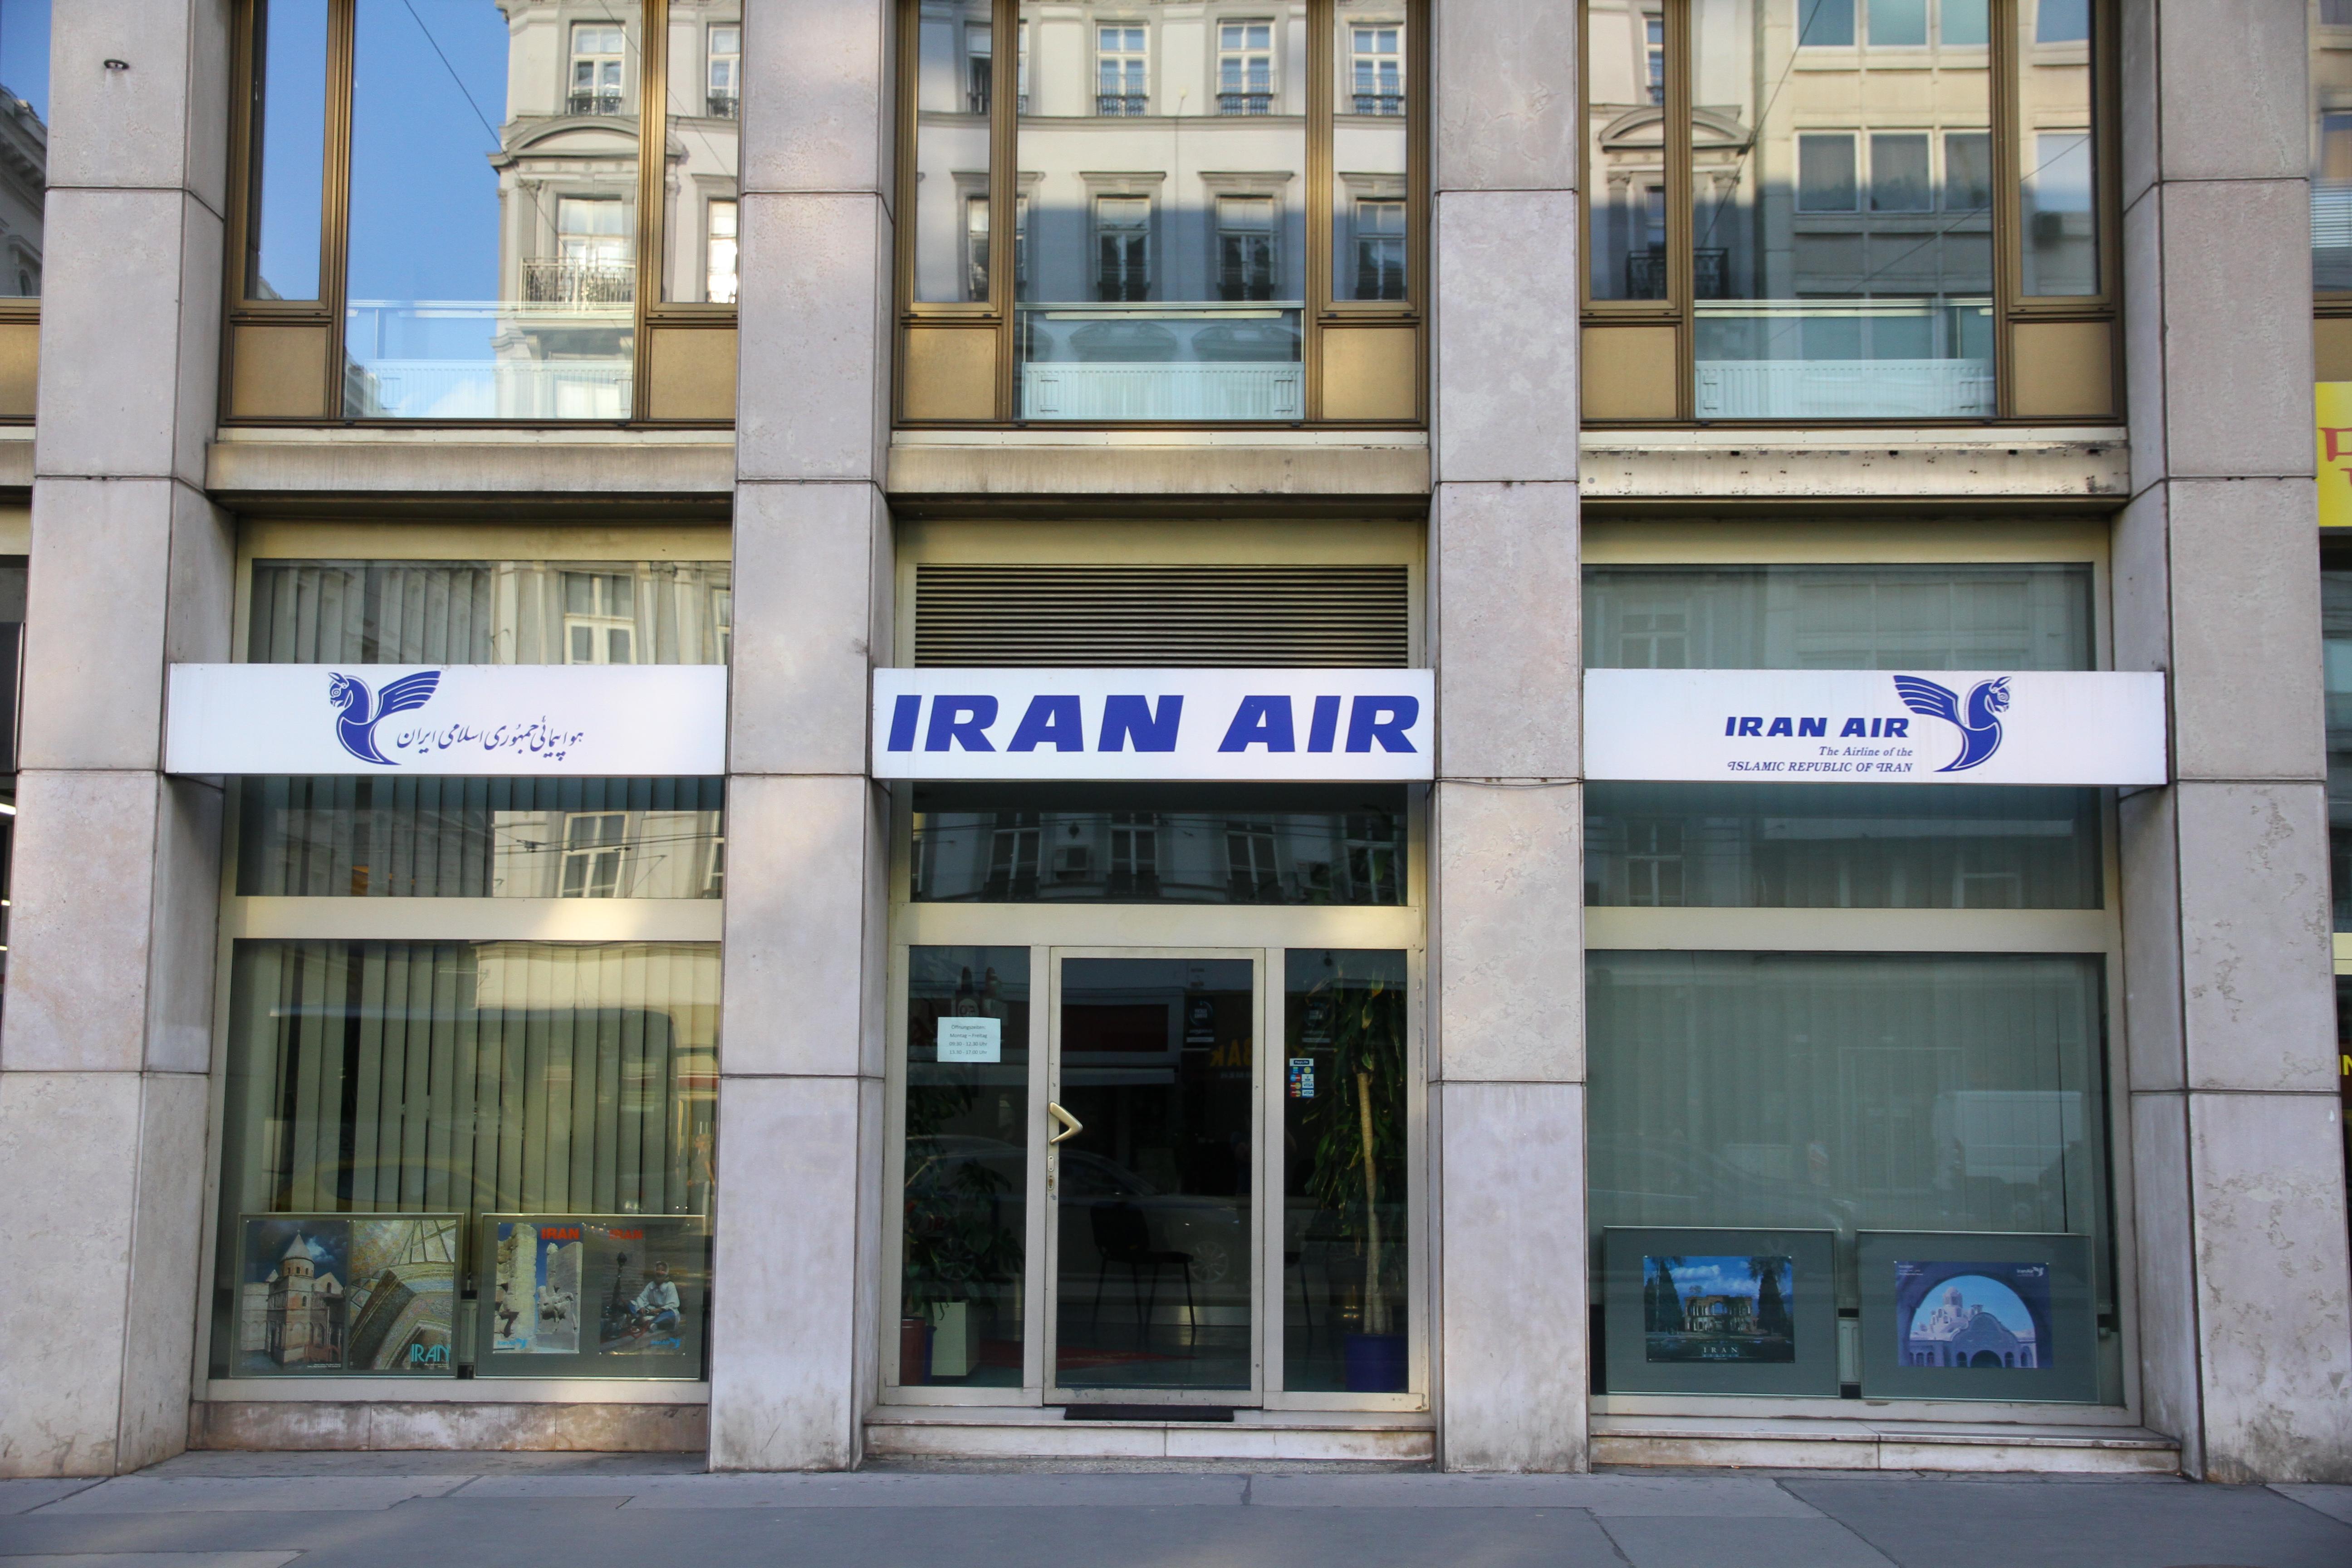 Iran Air Austria office 1010 Wien, Opernring 1.JPG